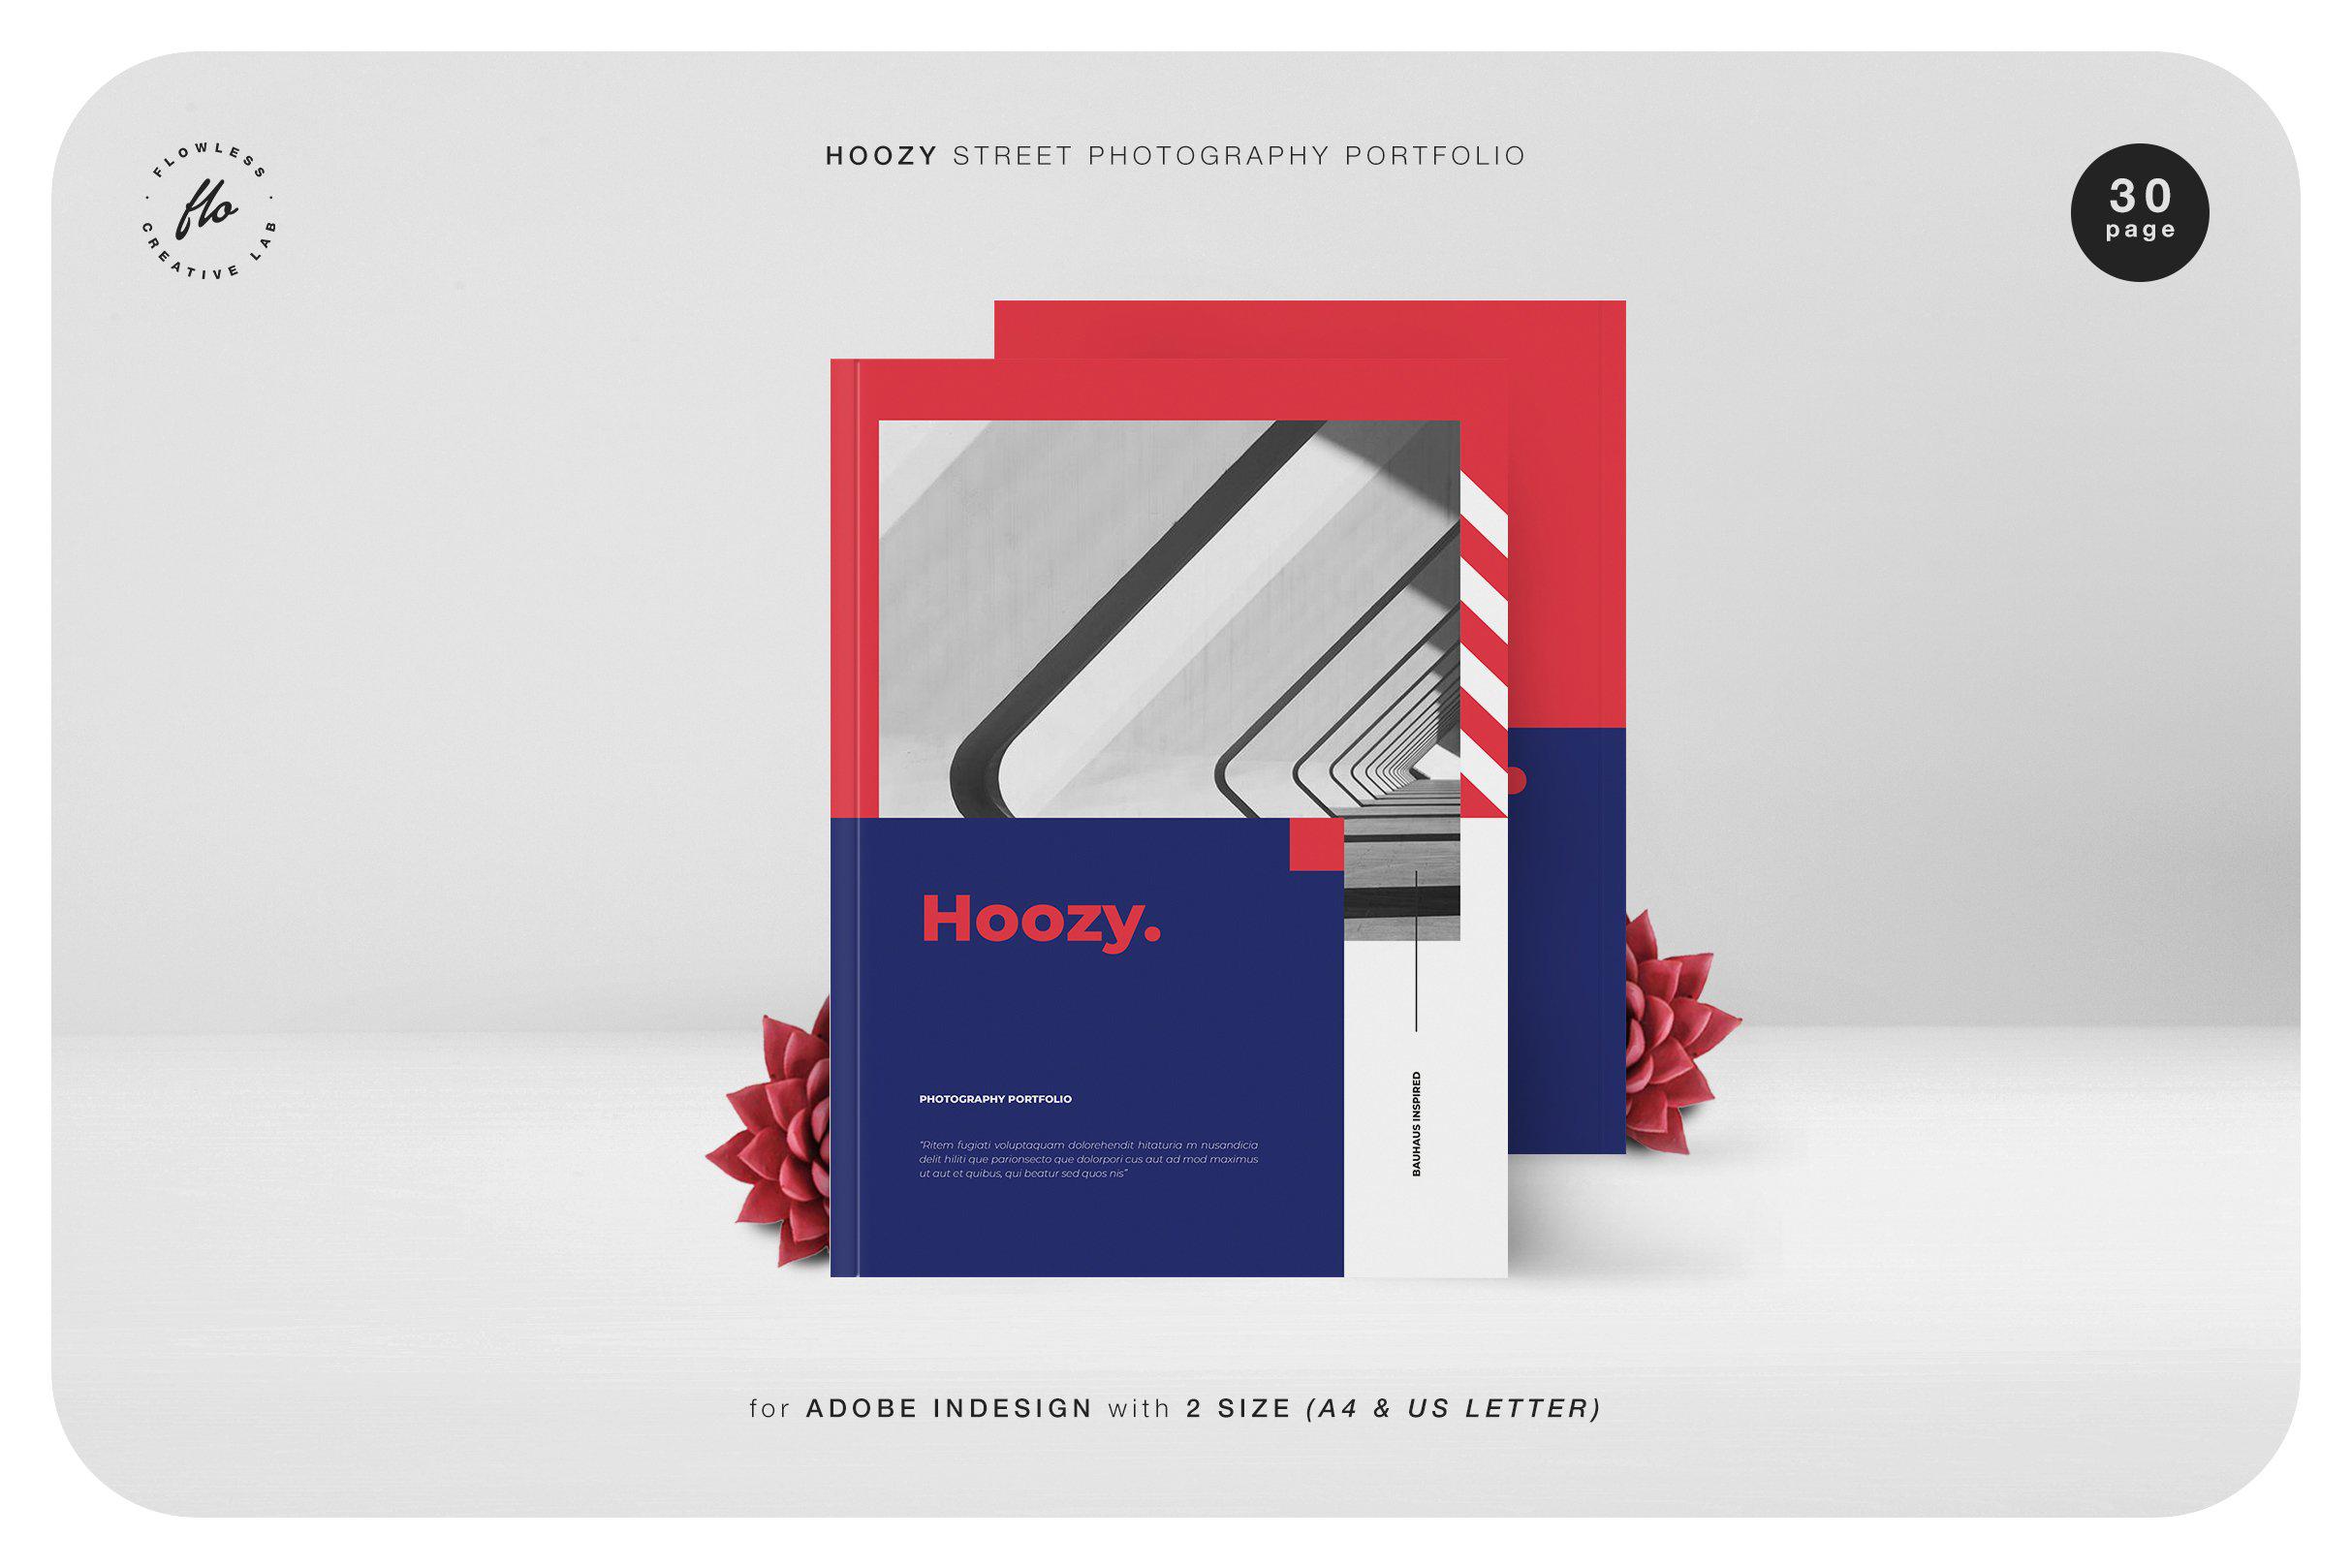 几何黑白摄影作品画册模板 HOOZY Street Photography Portfolio